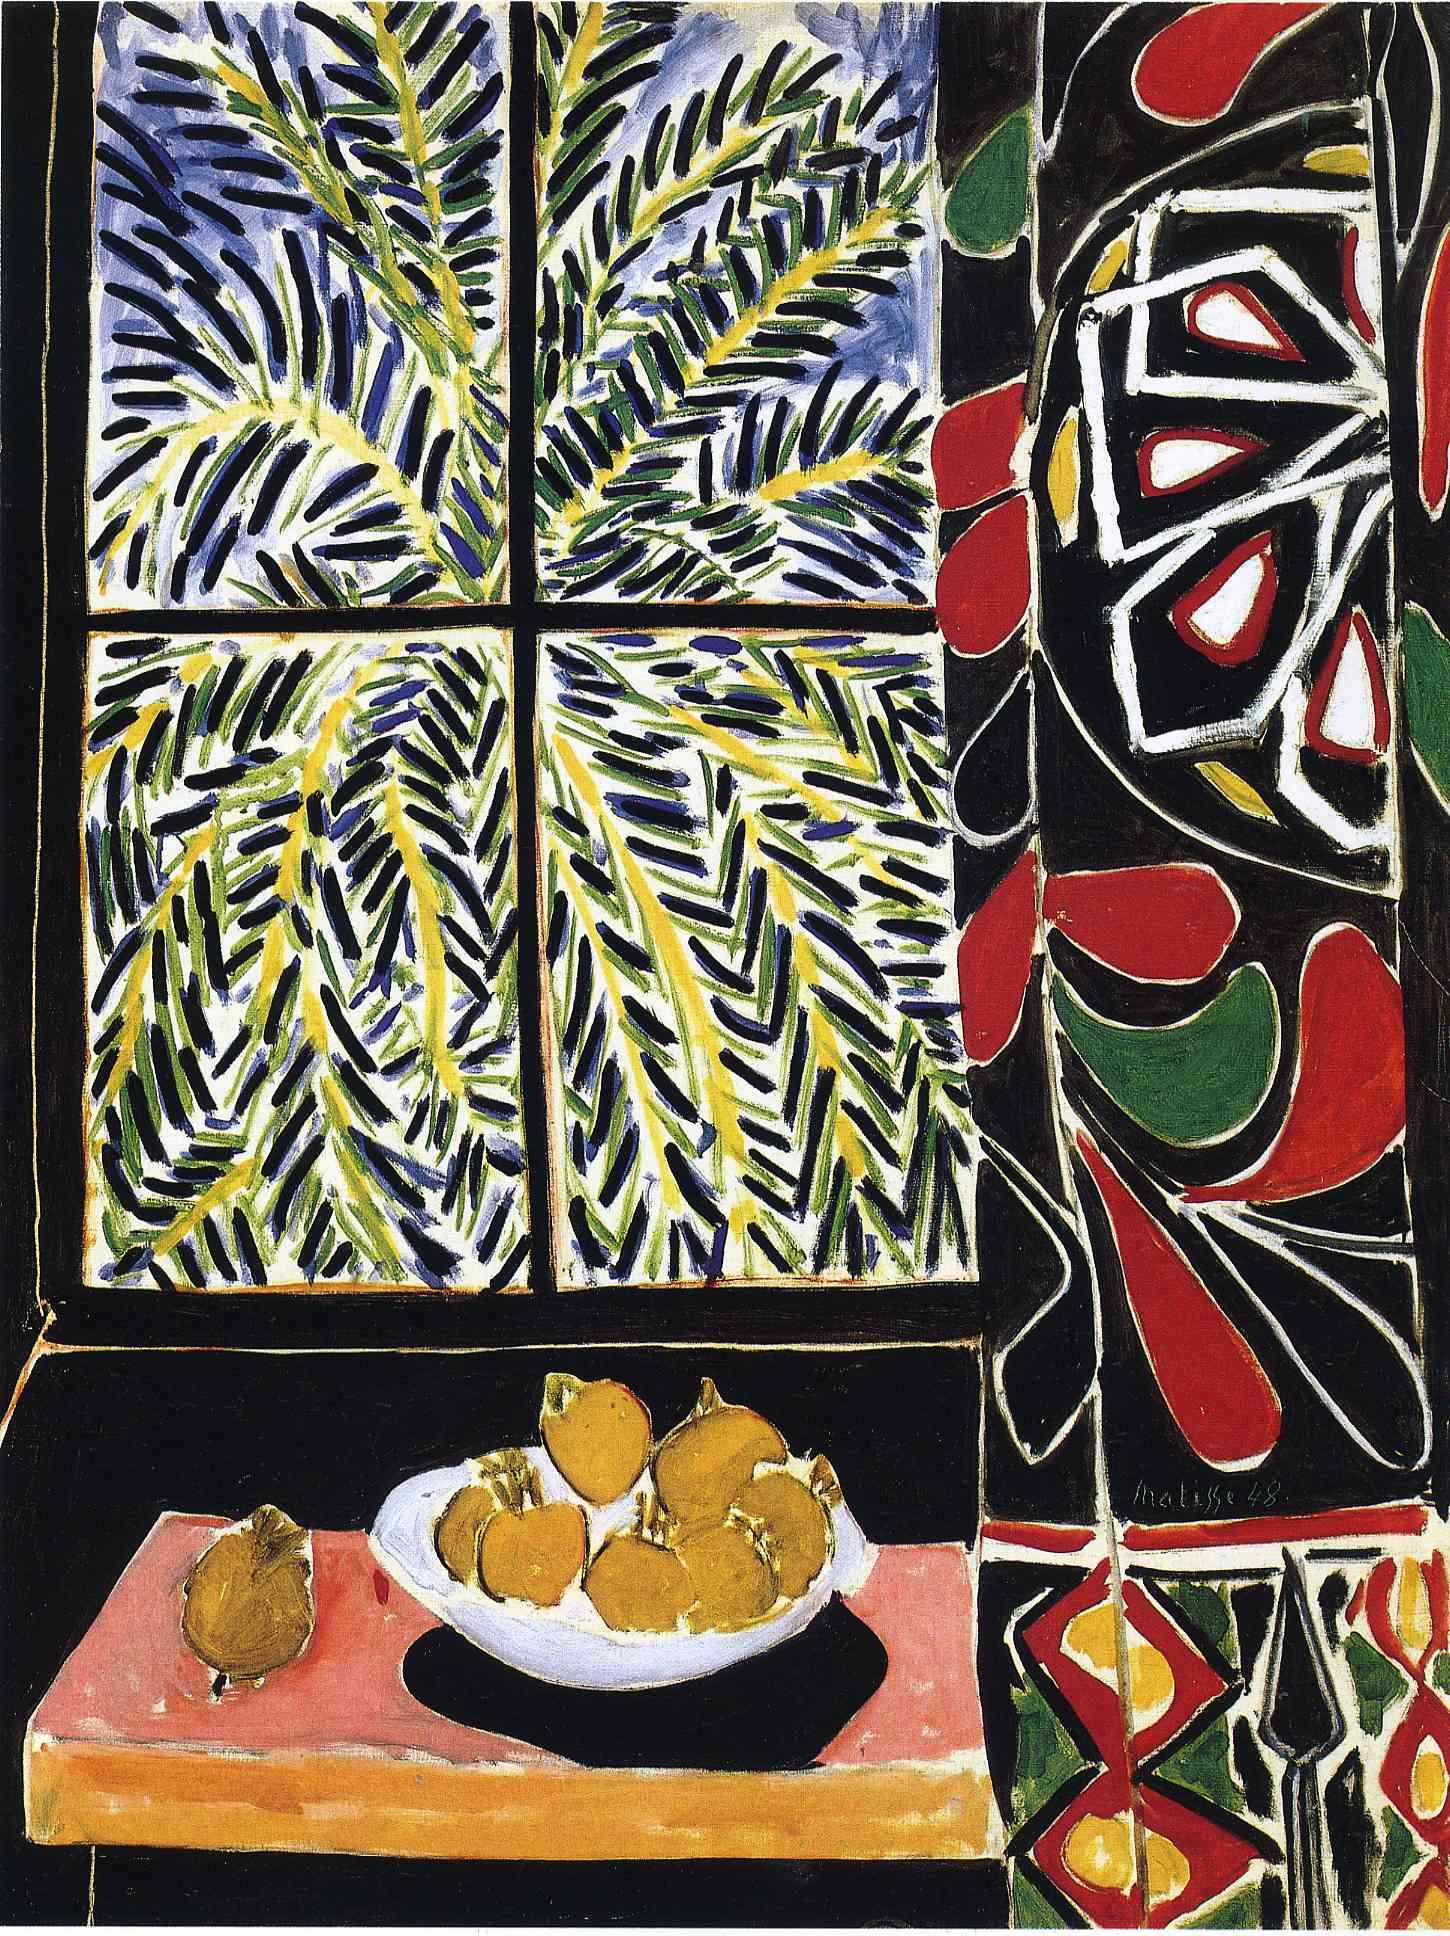 Open window matisse - Interior With Egyptian Curtain 1948 Henri Matisse Wikiart Org